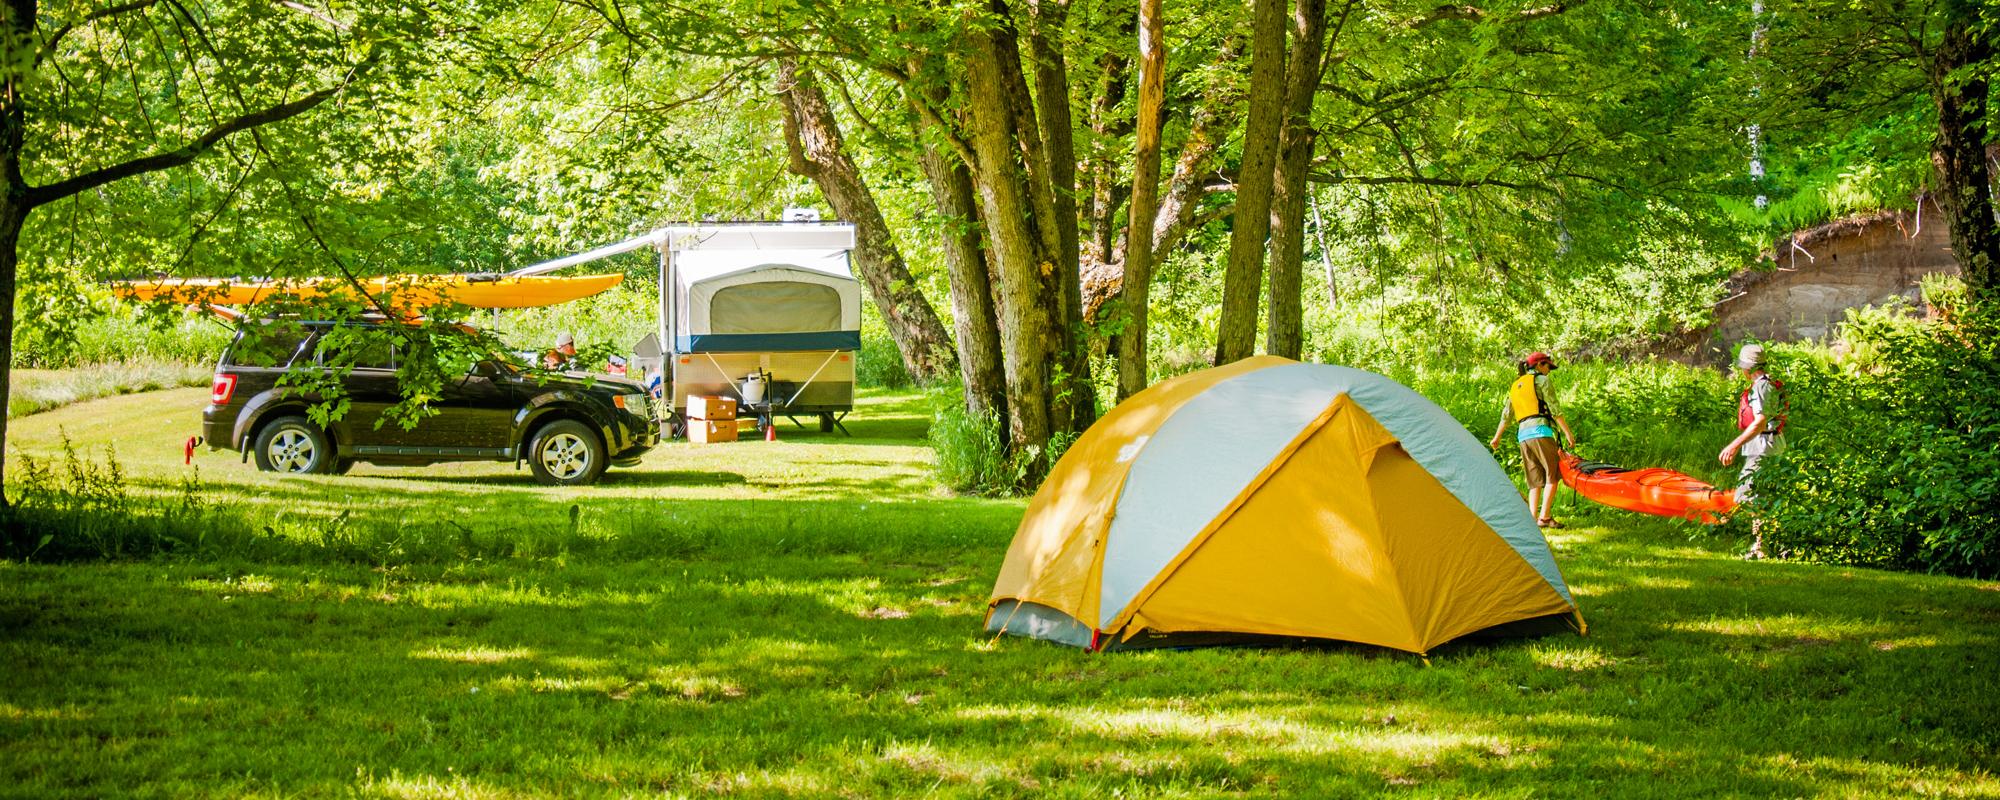 Camping Nature Plein Air - Client xPayrience